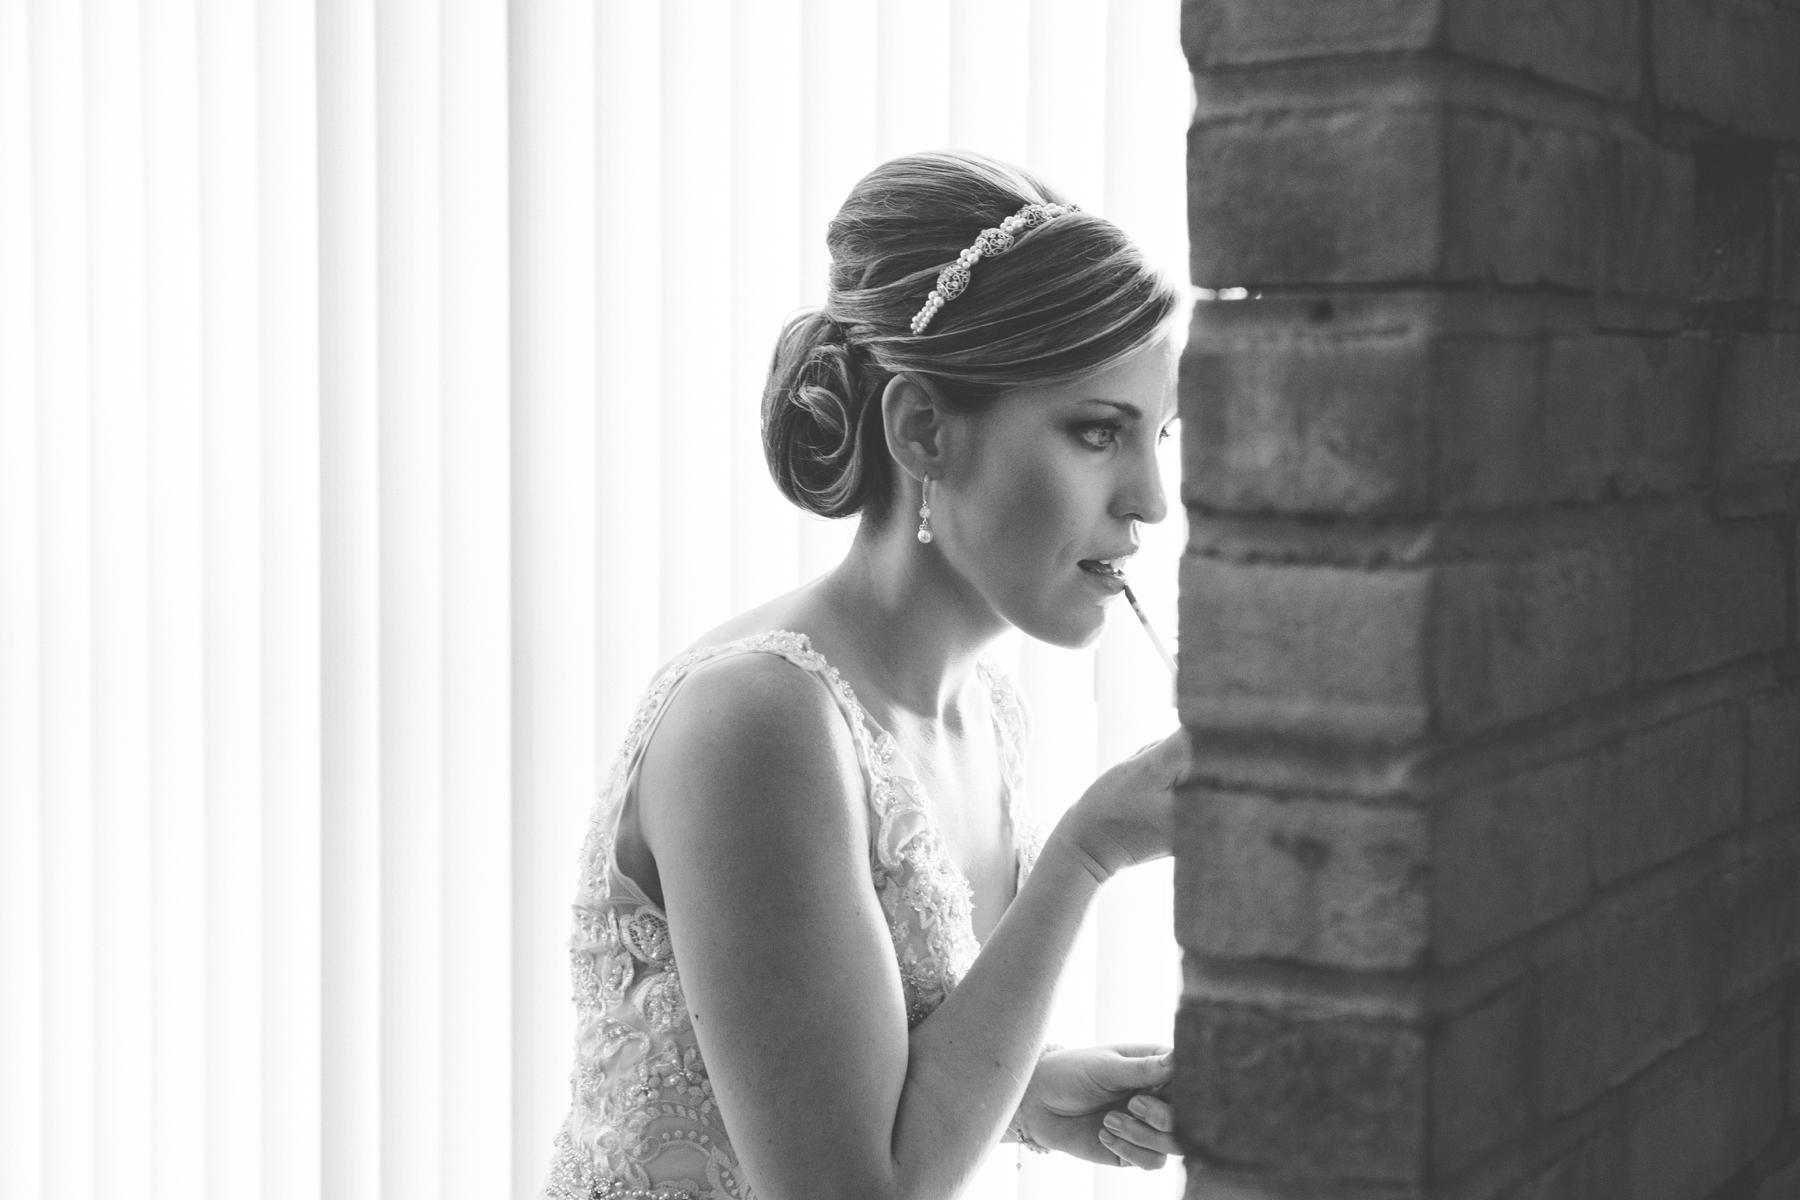 Ben_Jillian_Midland_Baycity_Wedding_0026.jpg